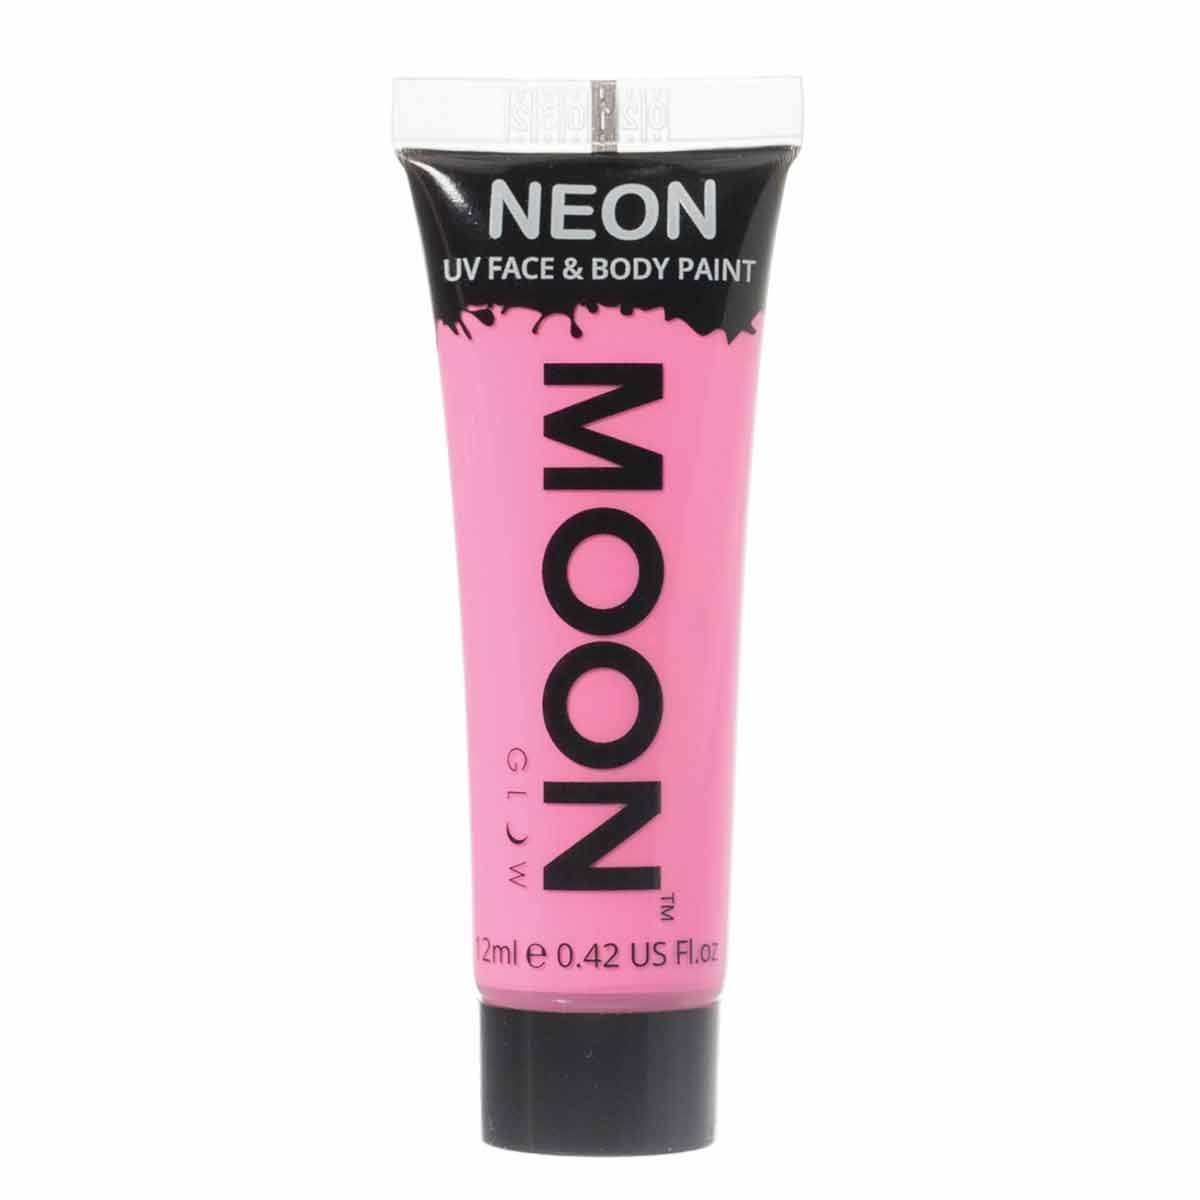 Moon Glow - 0.42oz Blacklight Neon UV Face & Body Paint - Pastel Pink